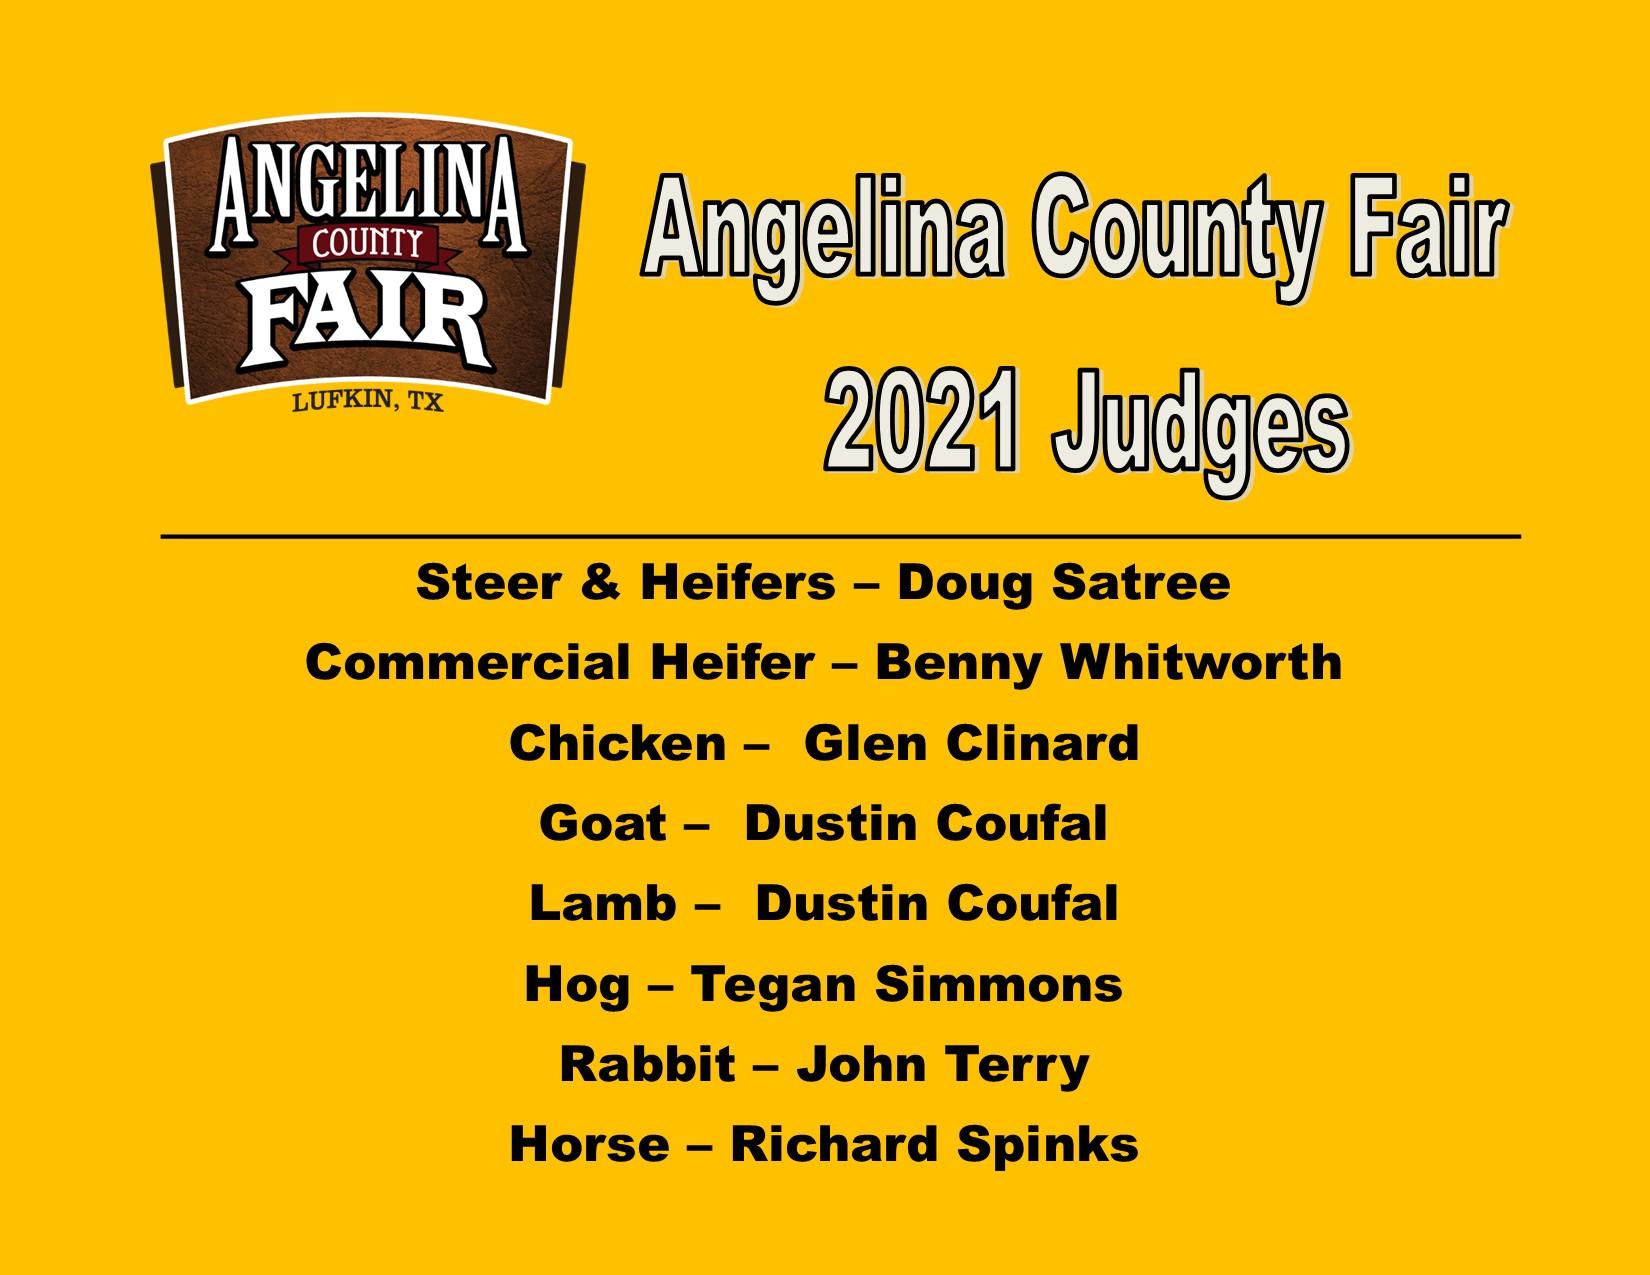 Judge list post 2021